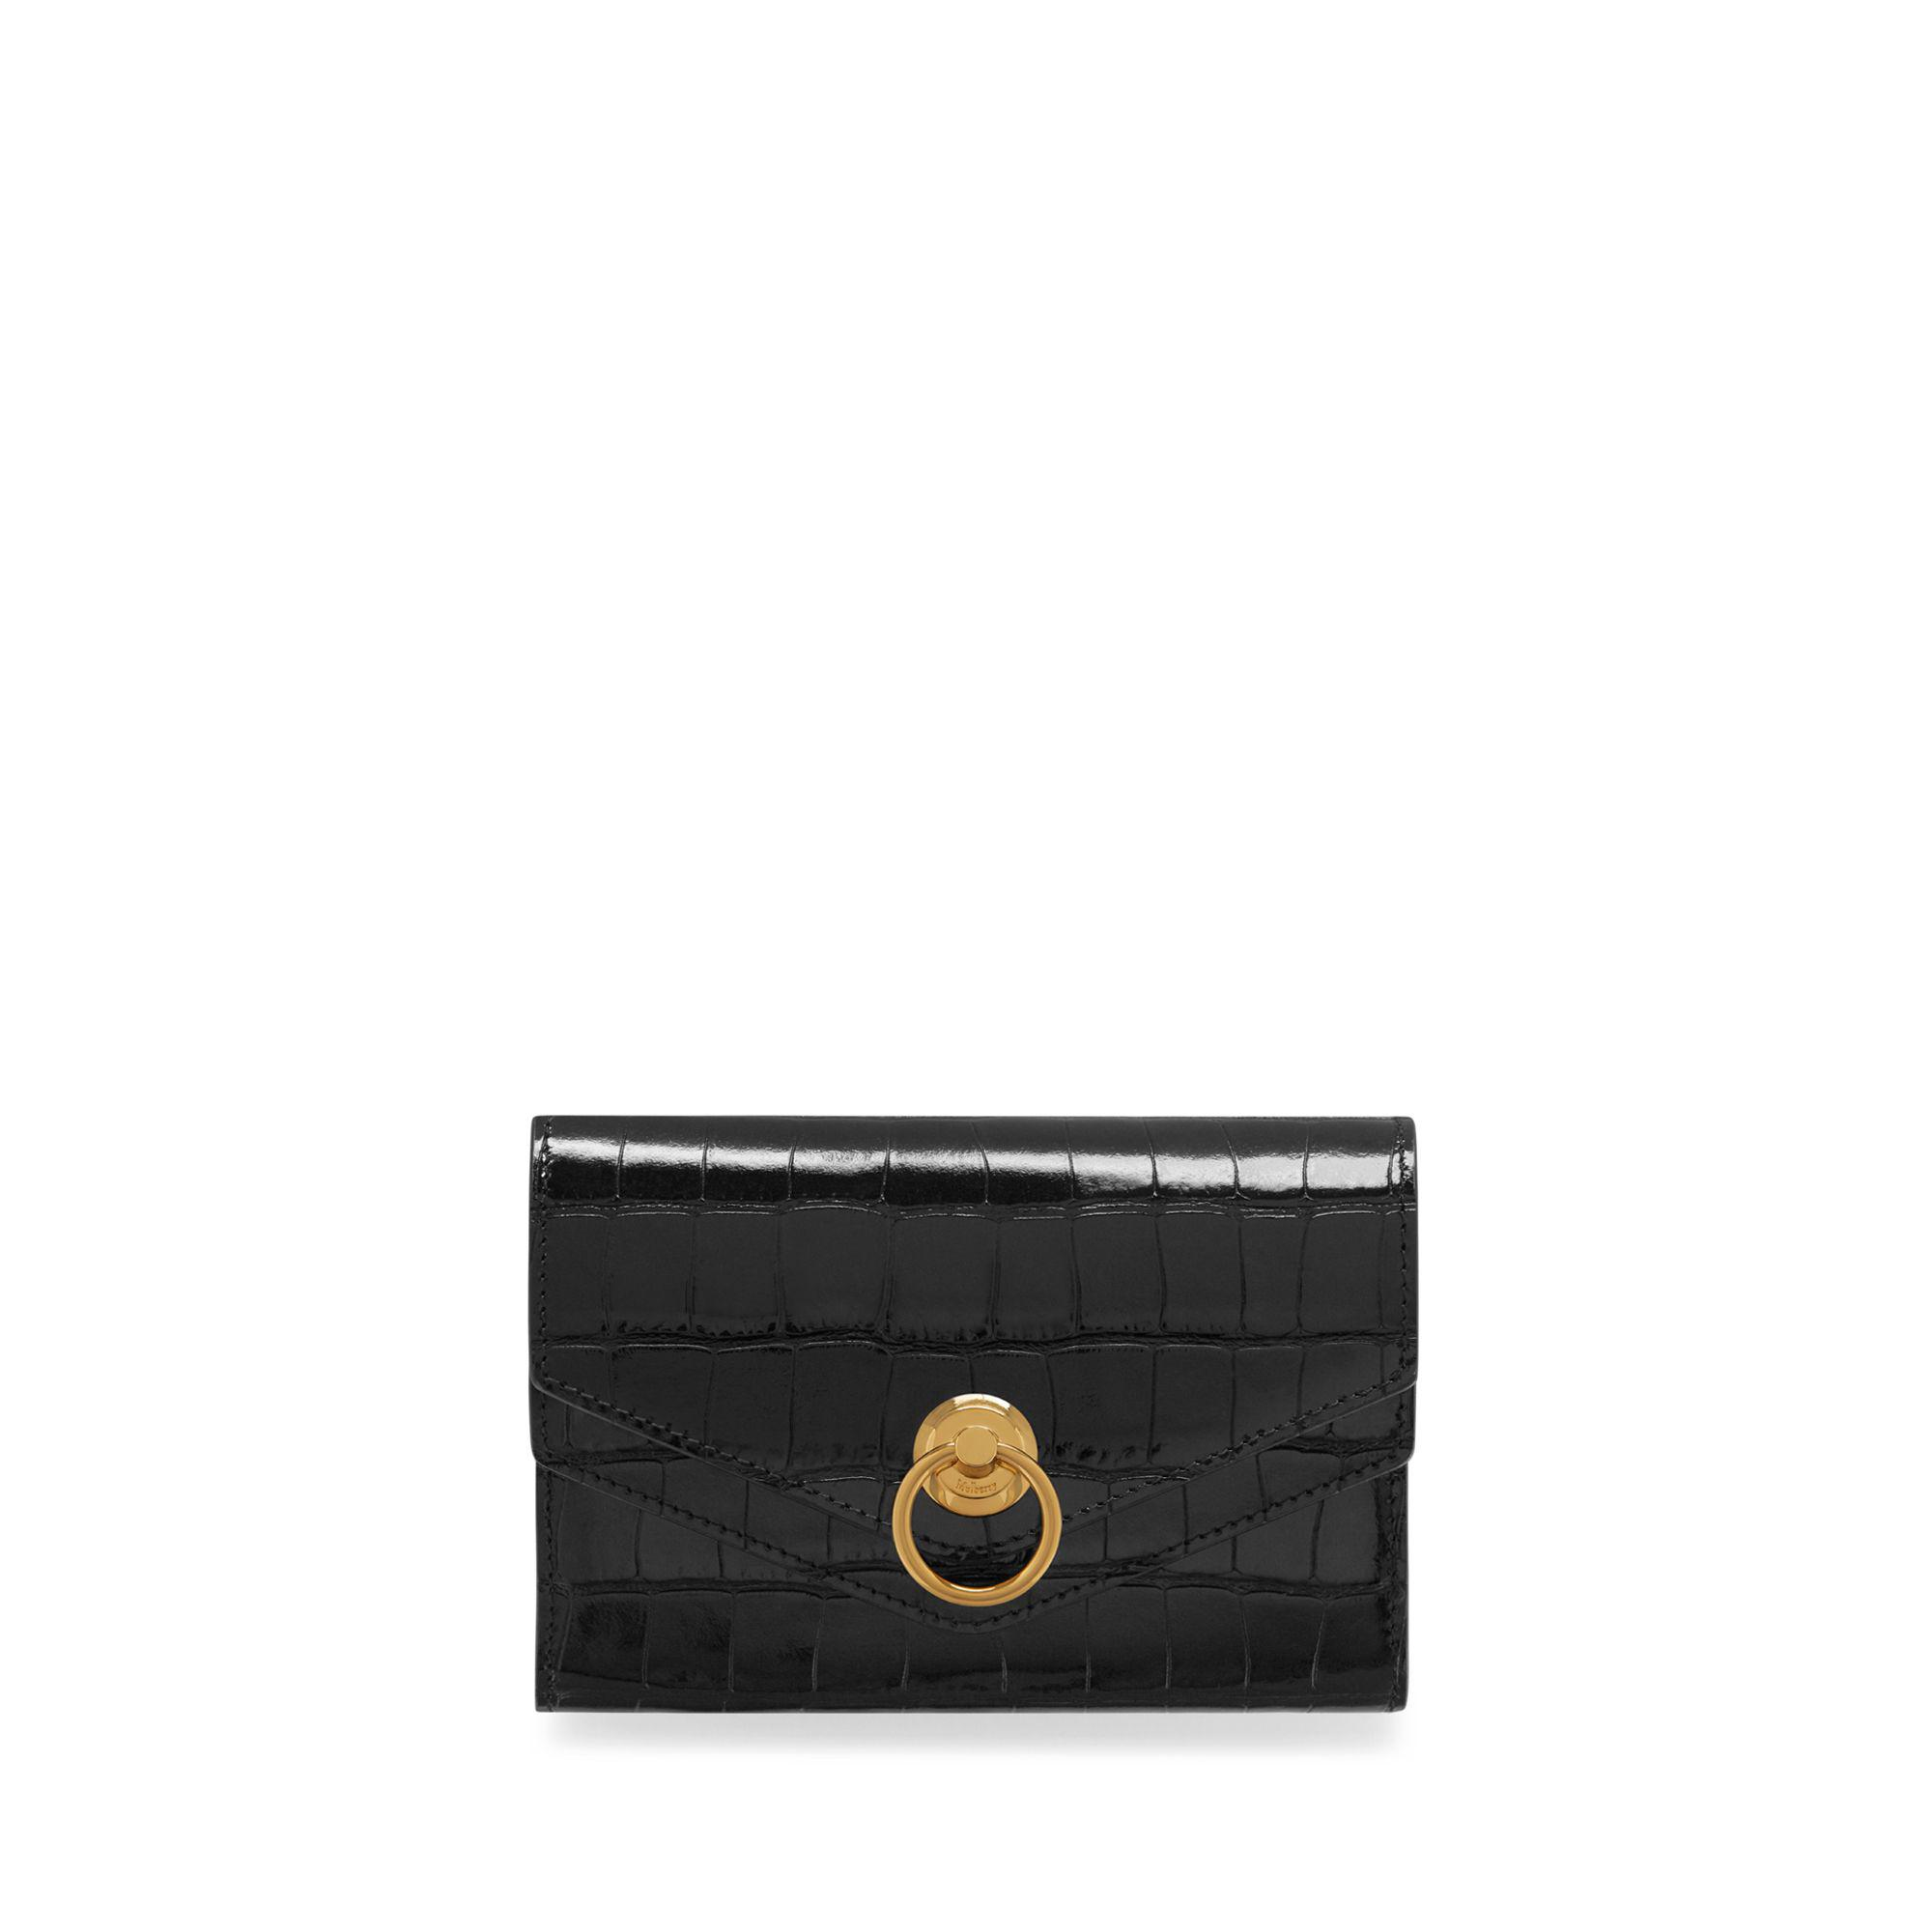 9df6a0a98f Mulberry Harlow Medium Wallet In Black Croc Print in Black - Lyst